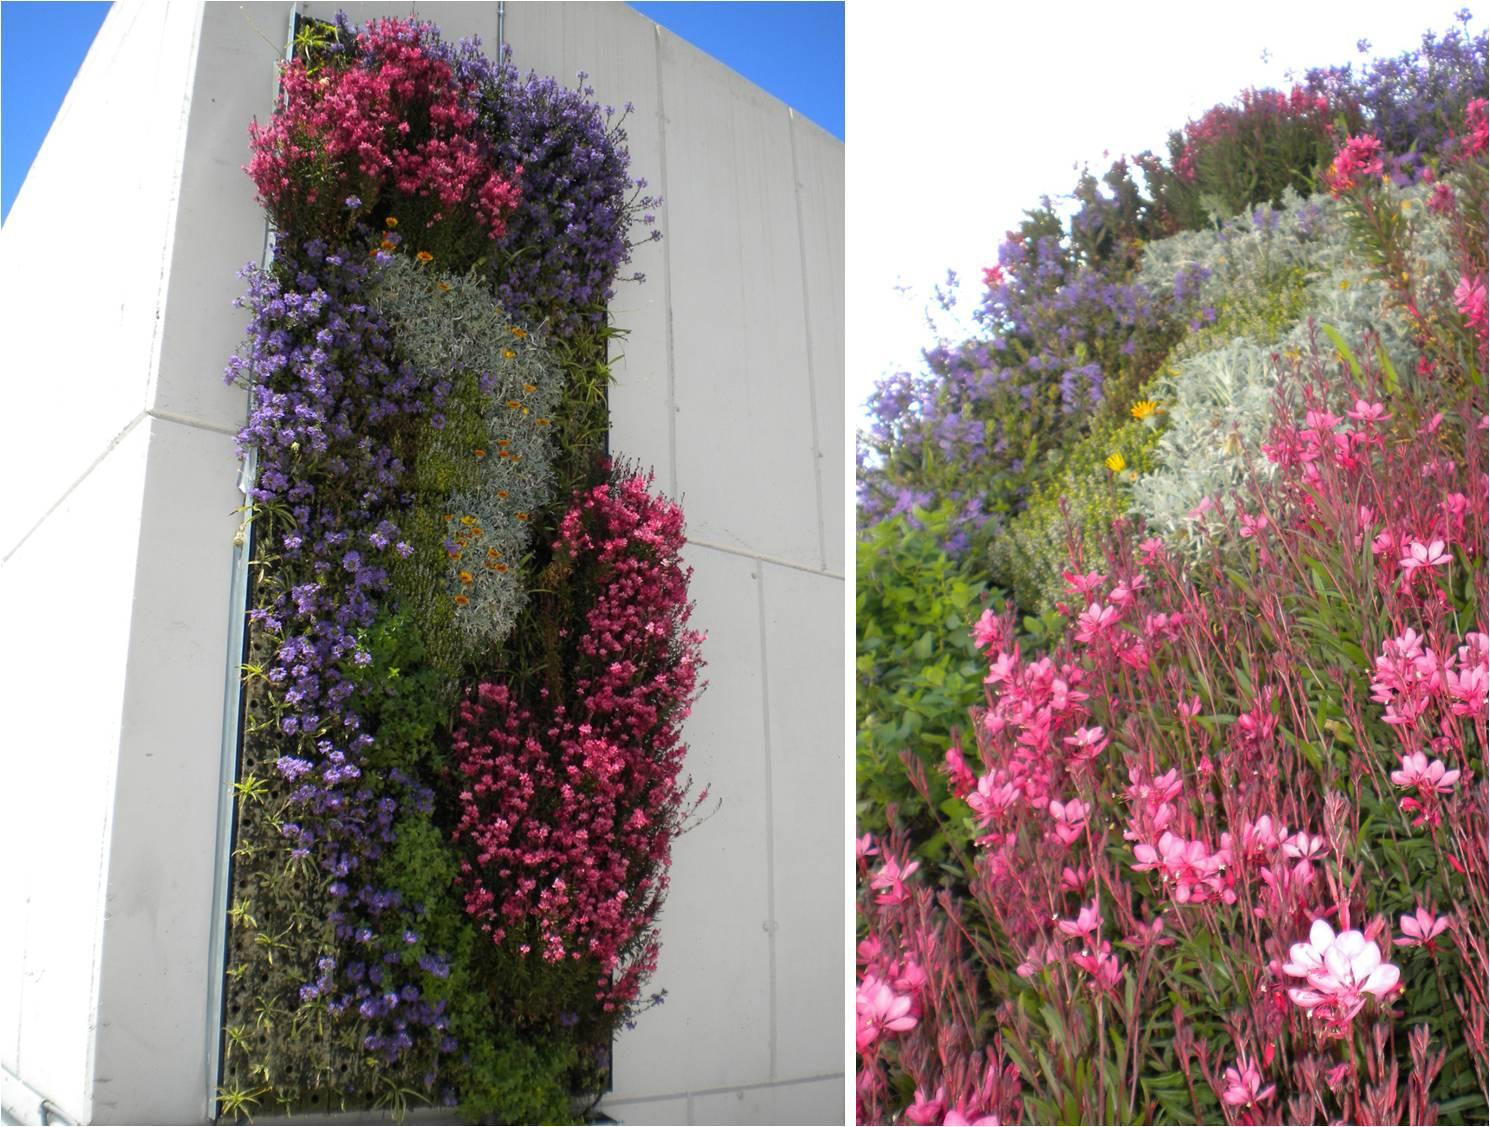 Grinea soluci n modular para jardiner a vertical for Lonas para jardines verticales